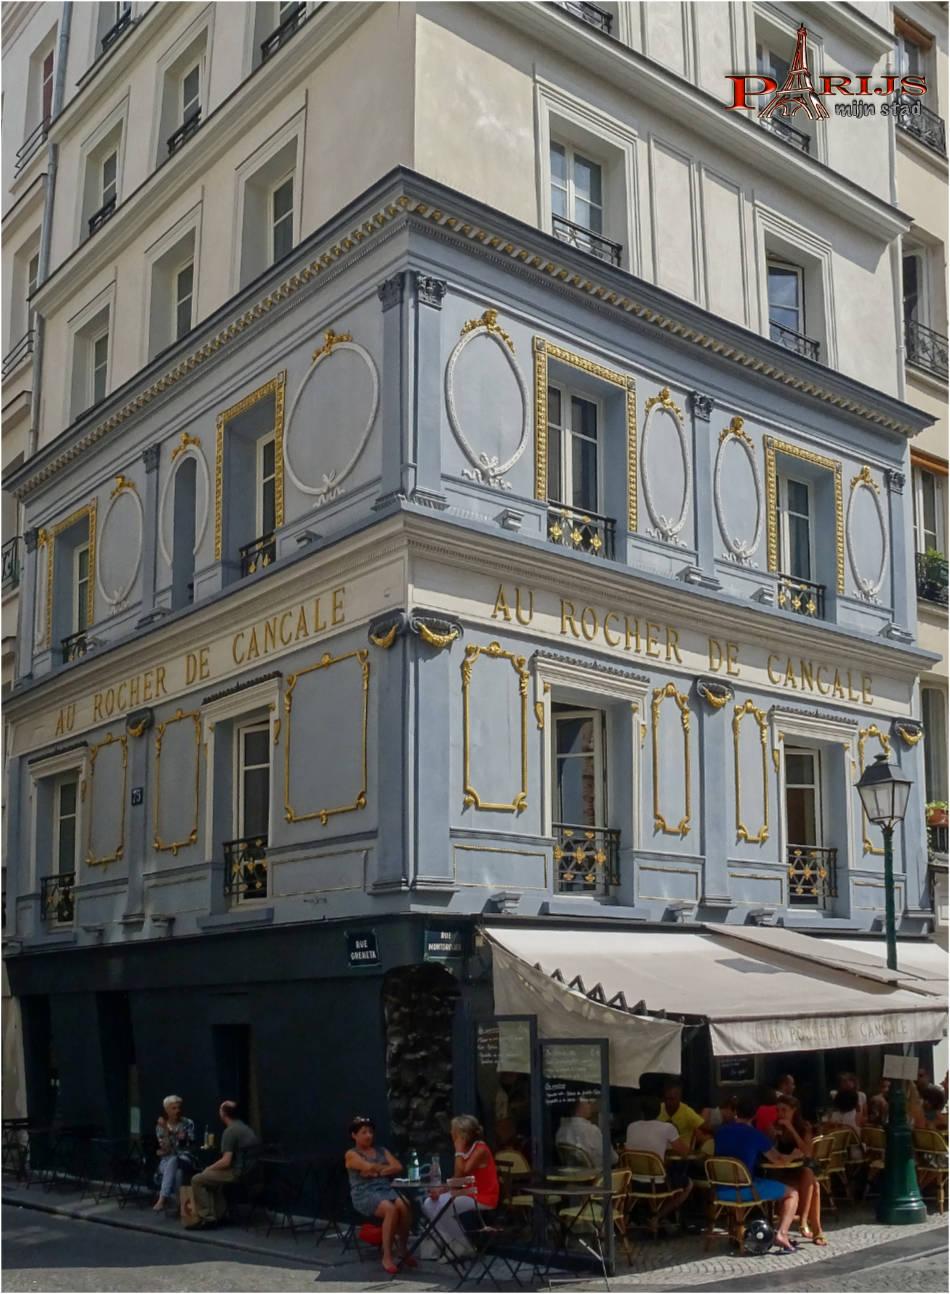 parijsmijnstad-restaurant Au Rocher de Cancale